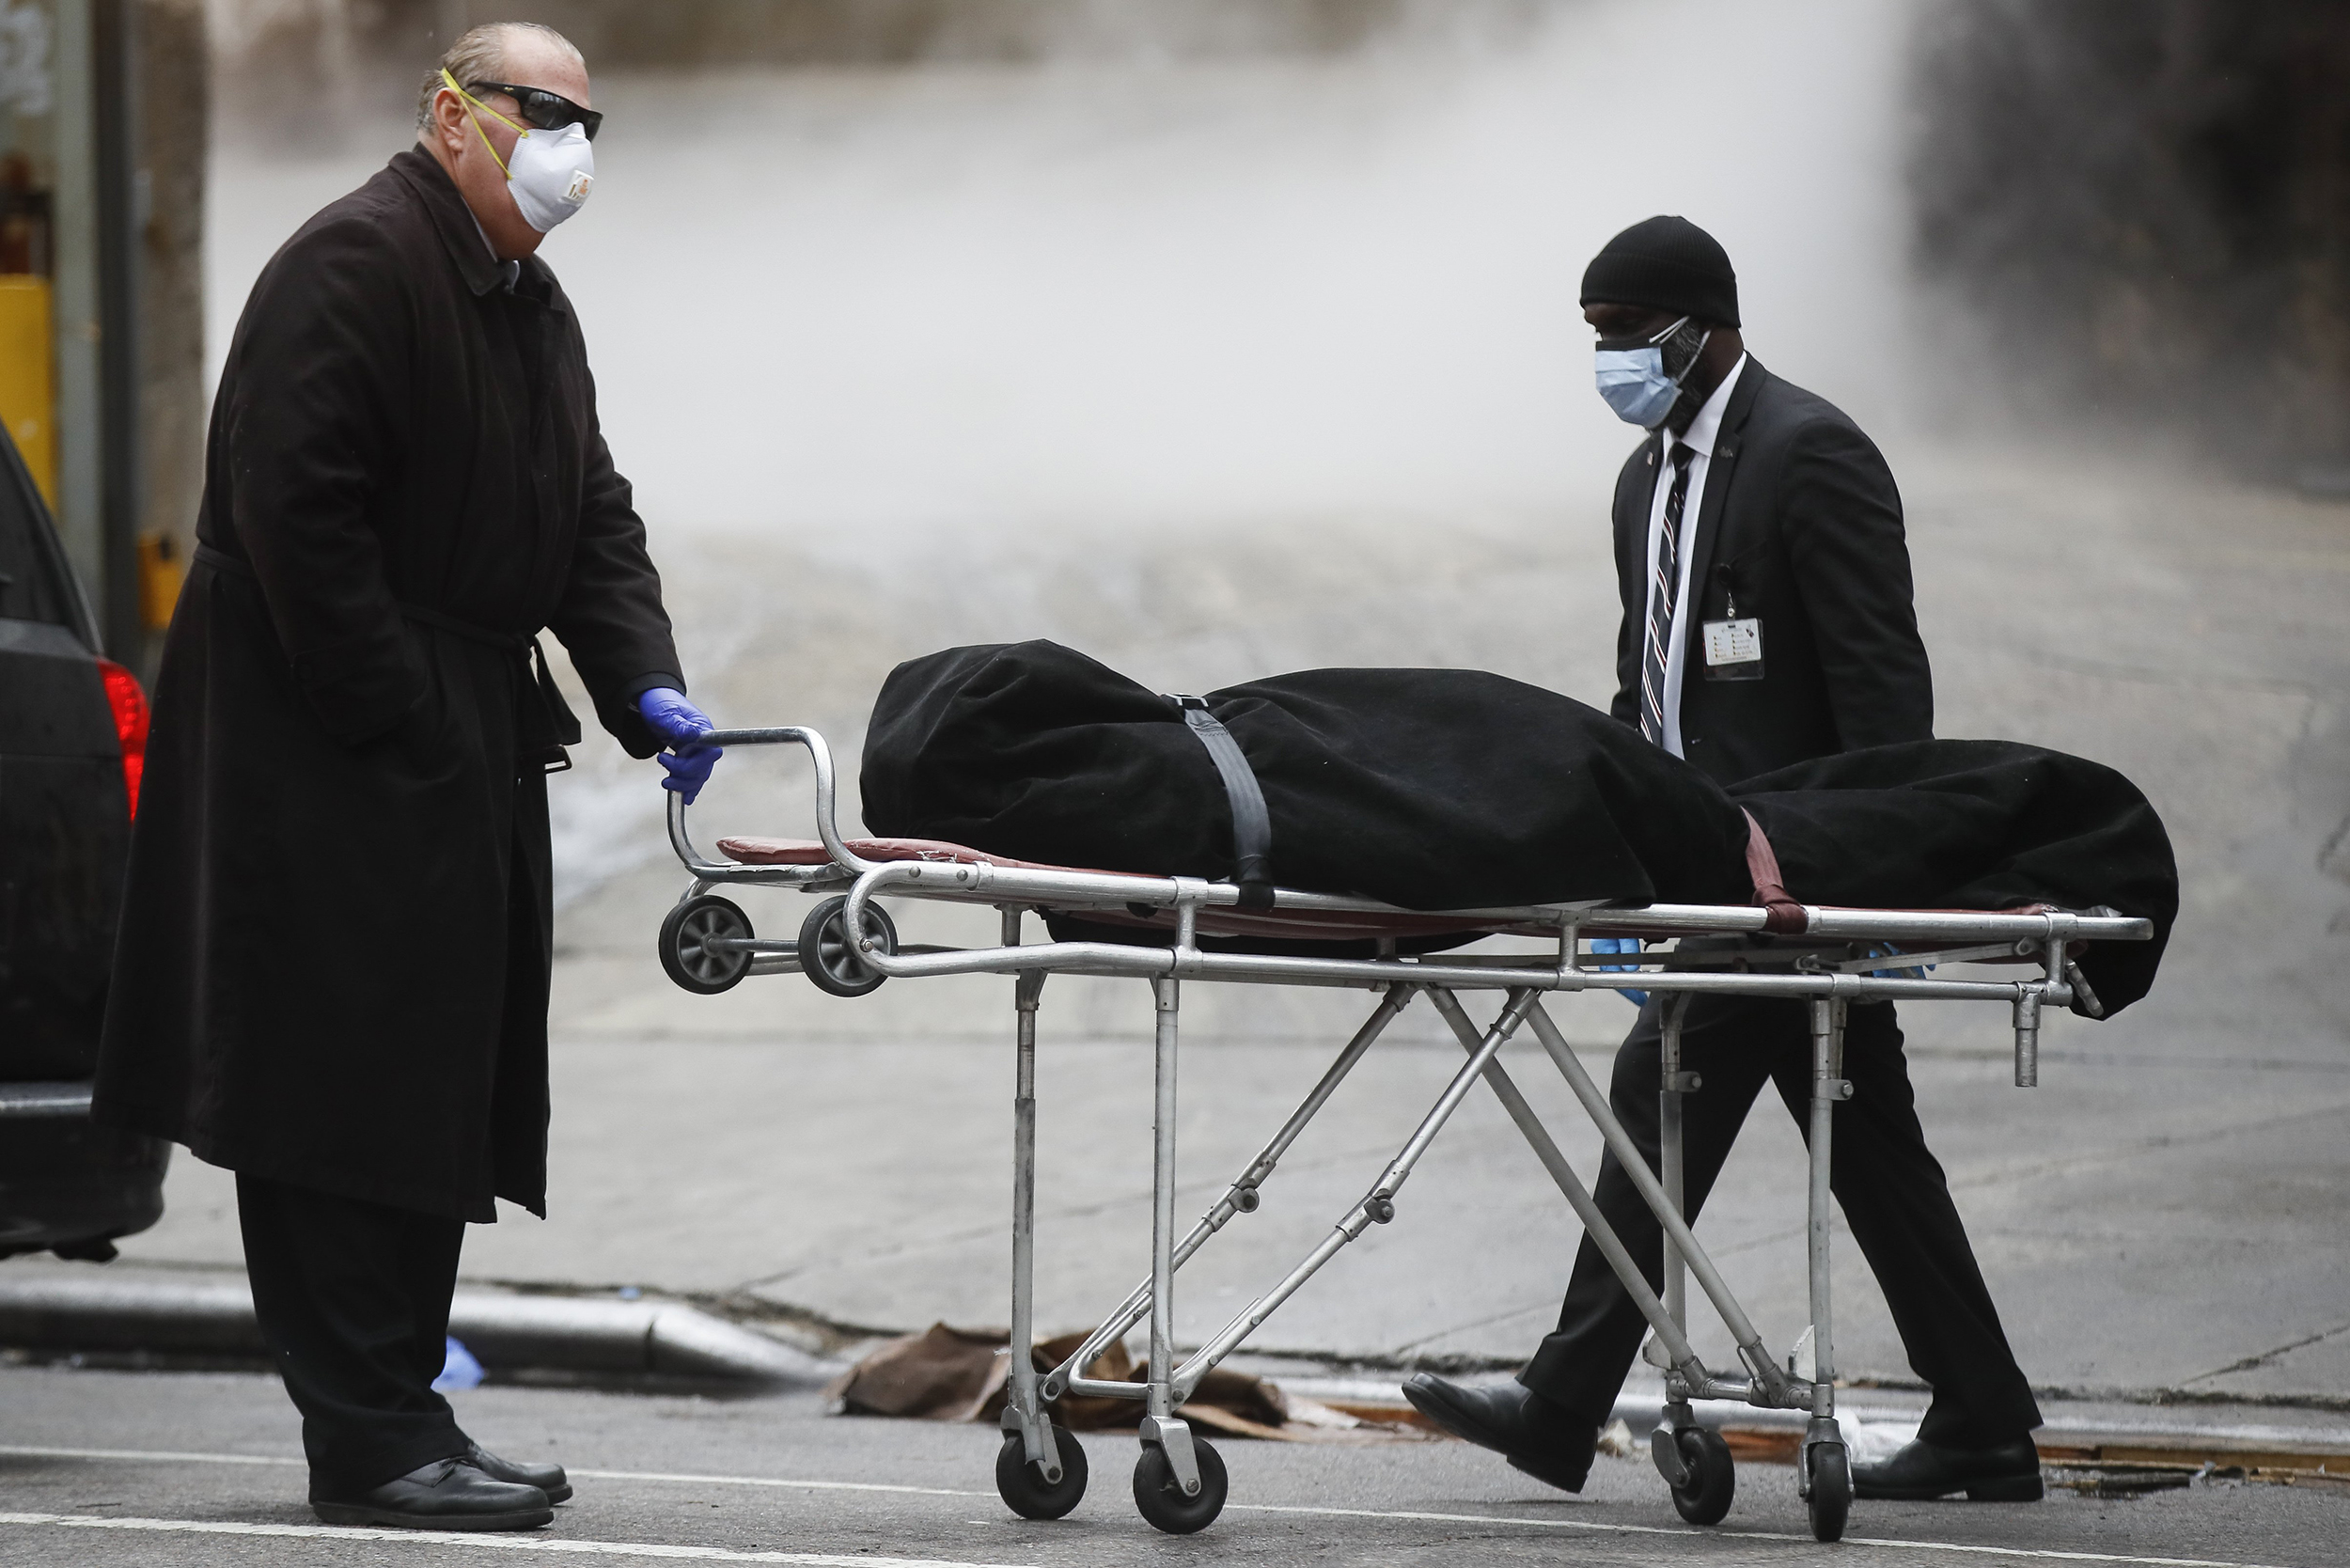 nbcnews.com - U.S. coronavirus deaths top 100,000